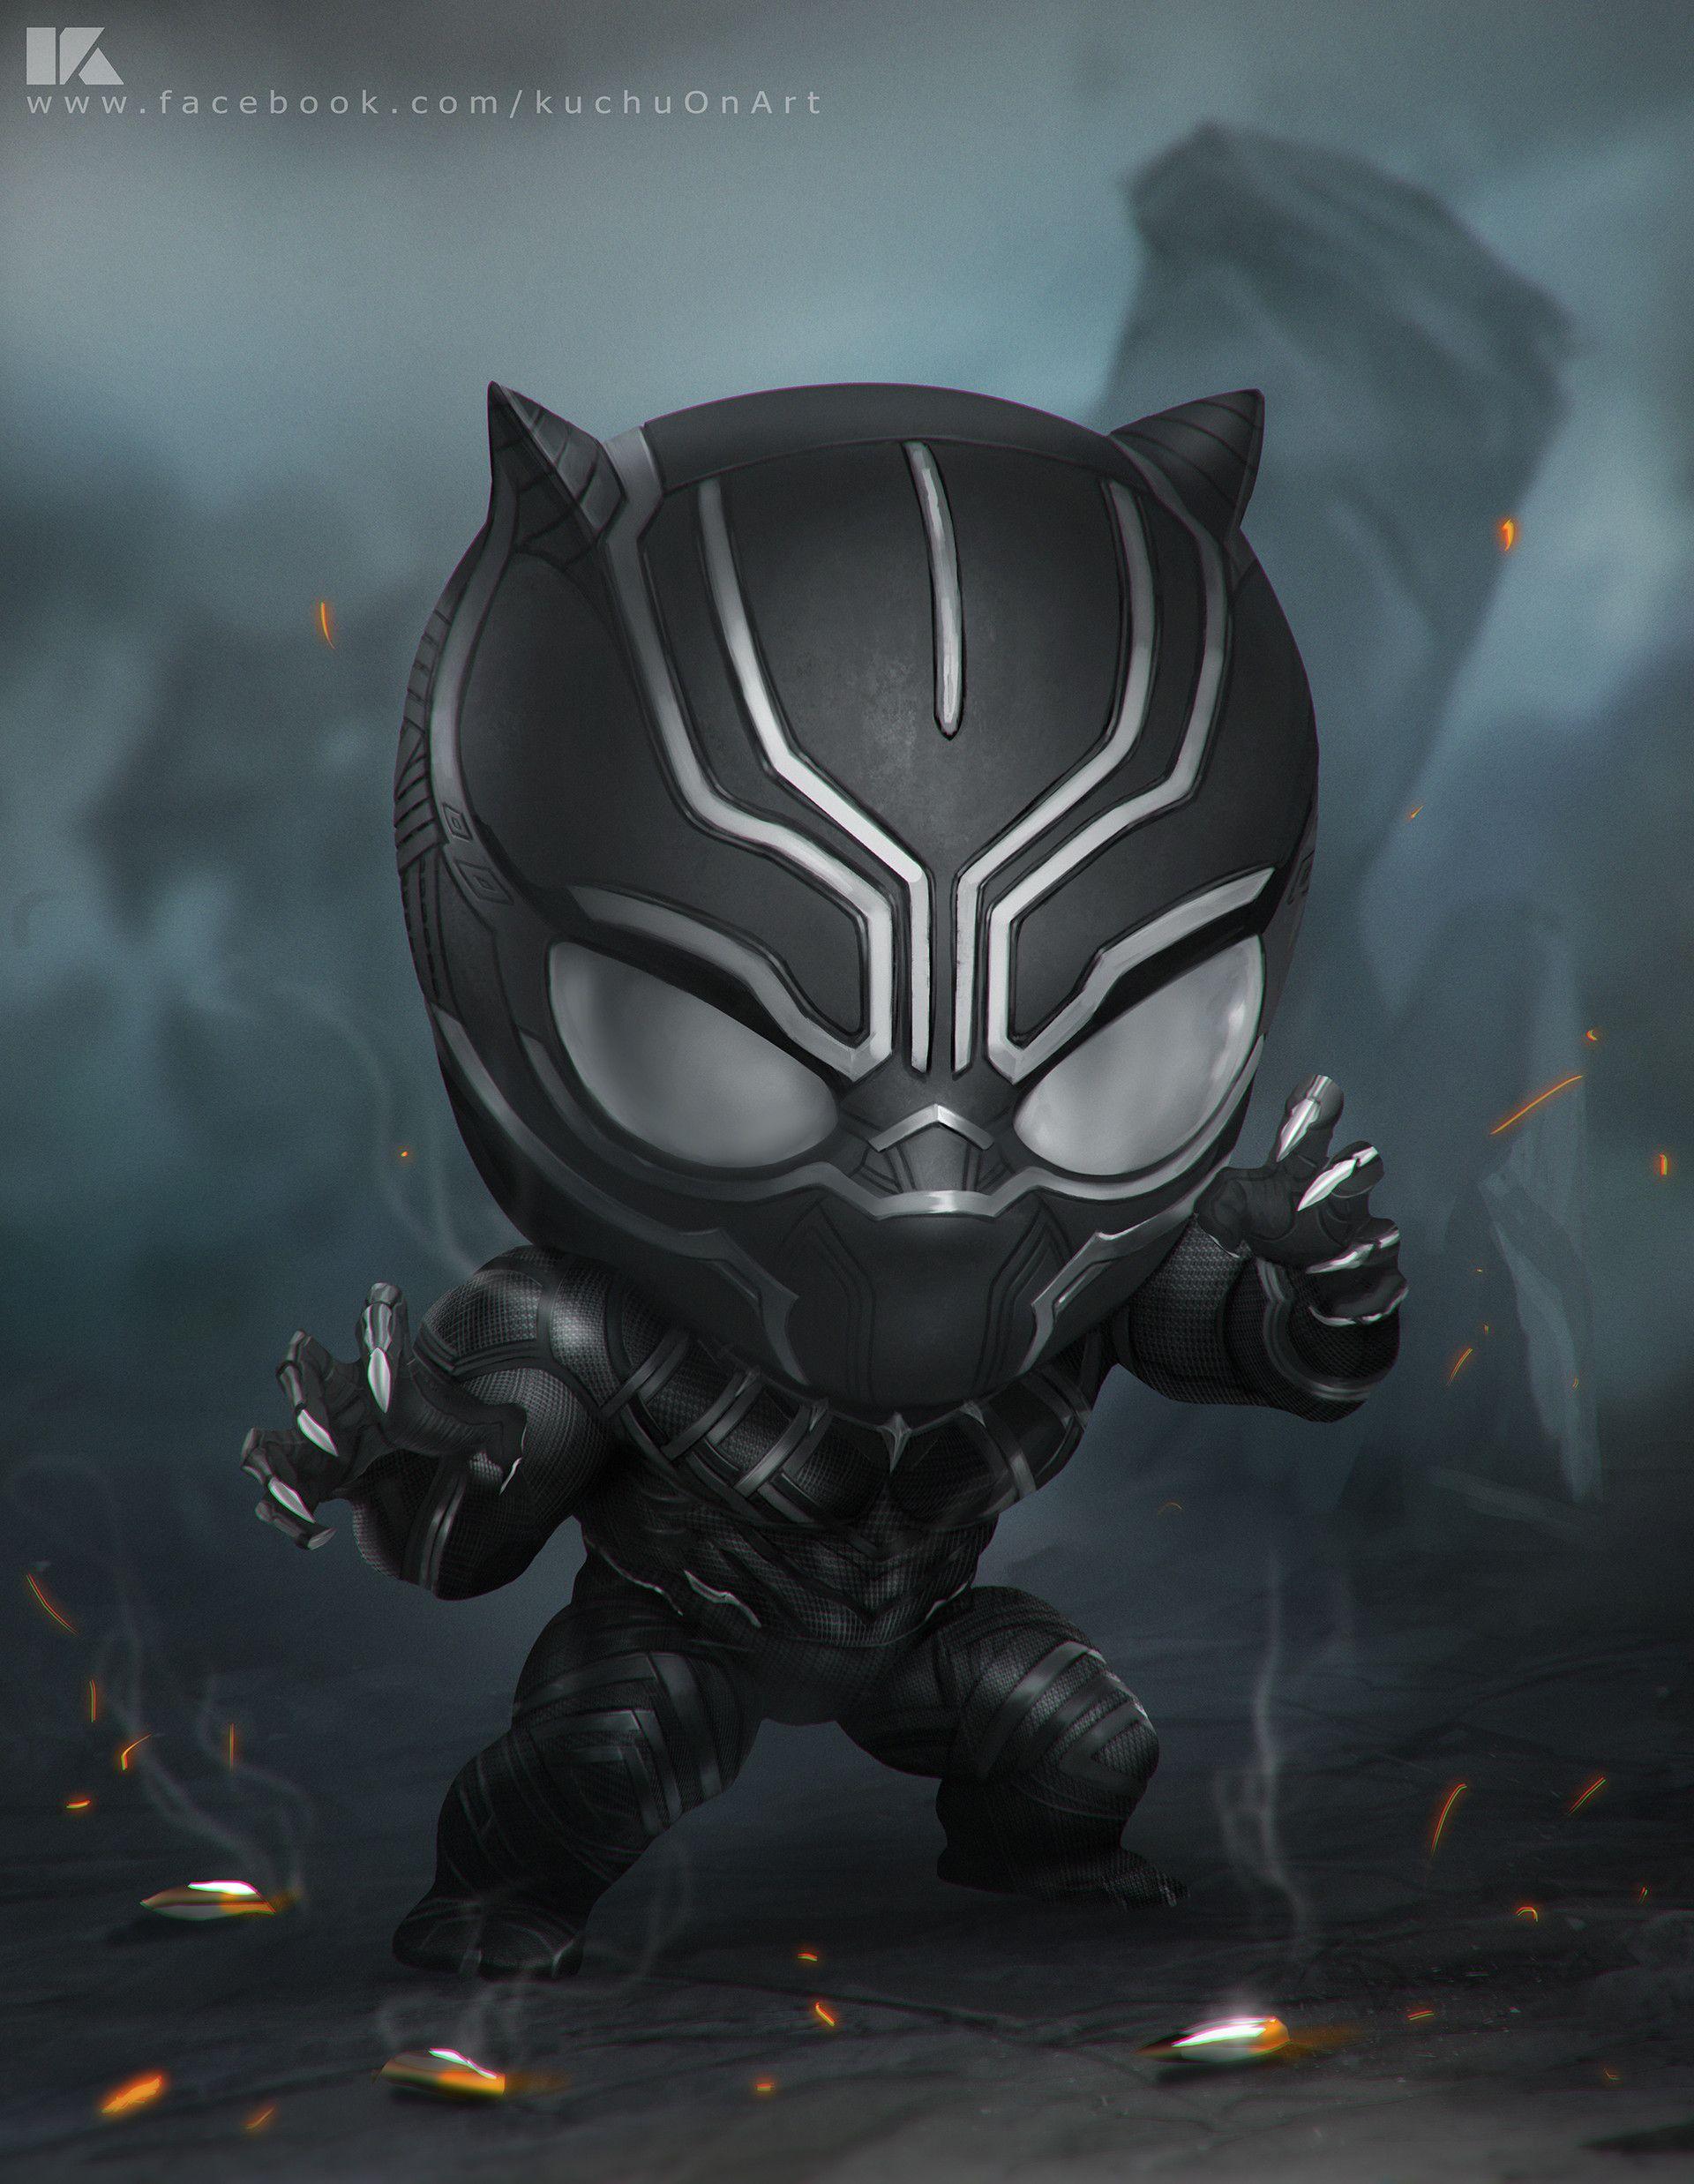 aeb08e1b ArtStation - Black panther, kuchu pack - Visit to grab an amazing super  hero shirt